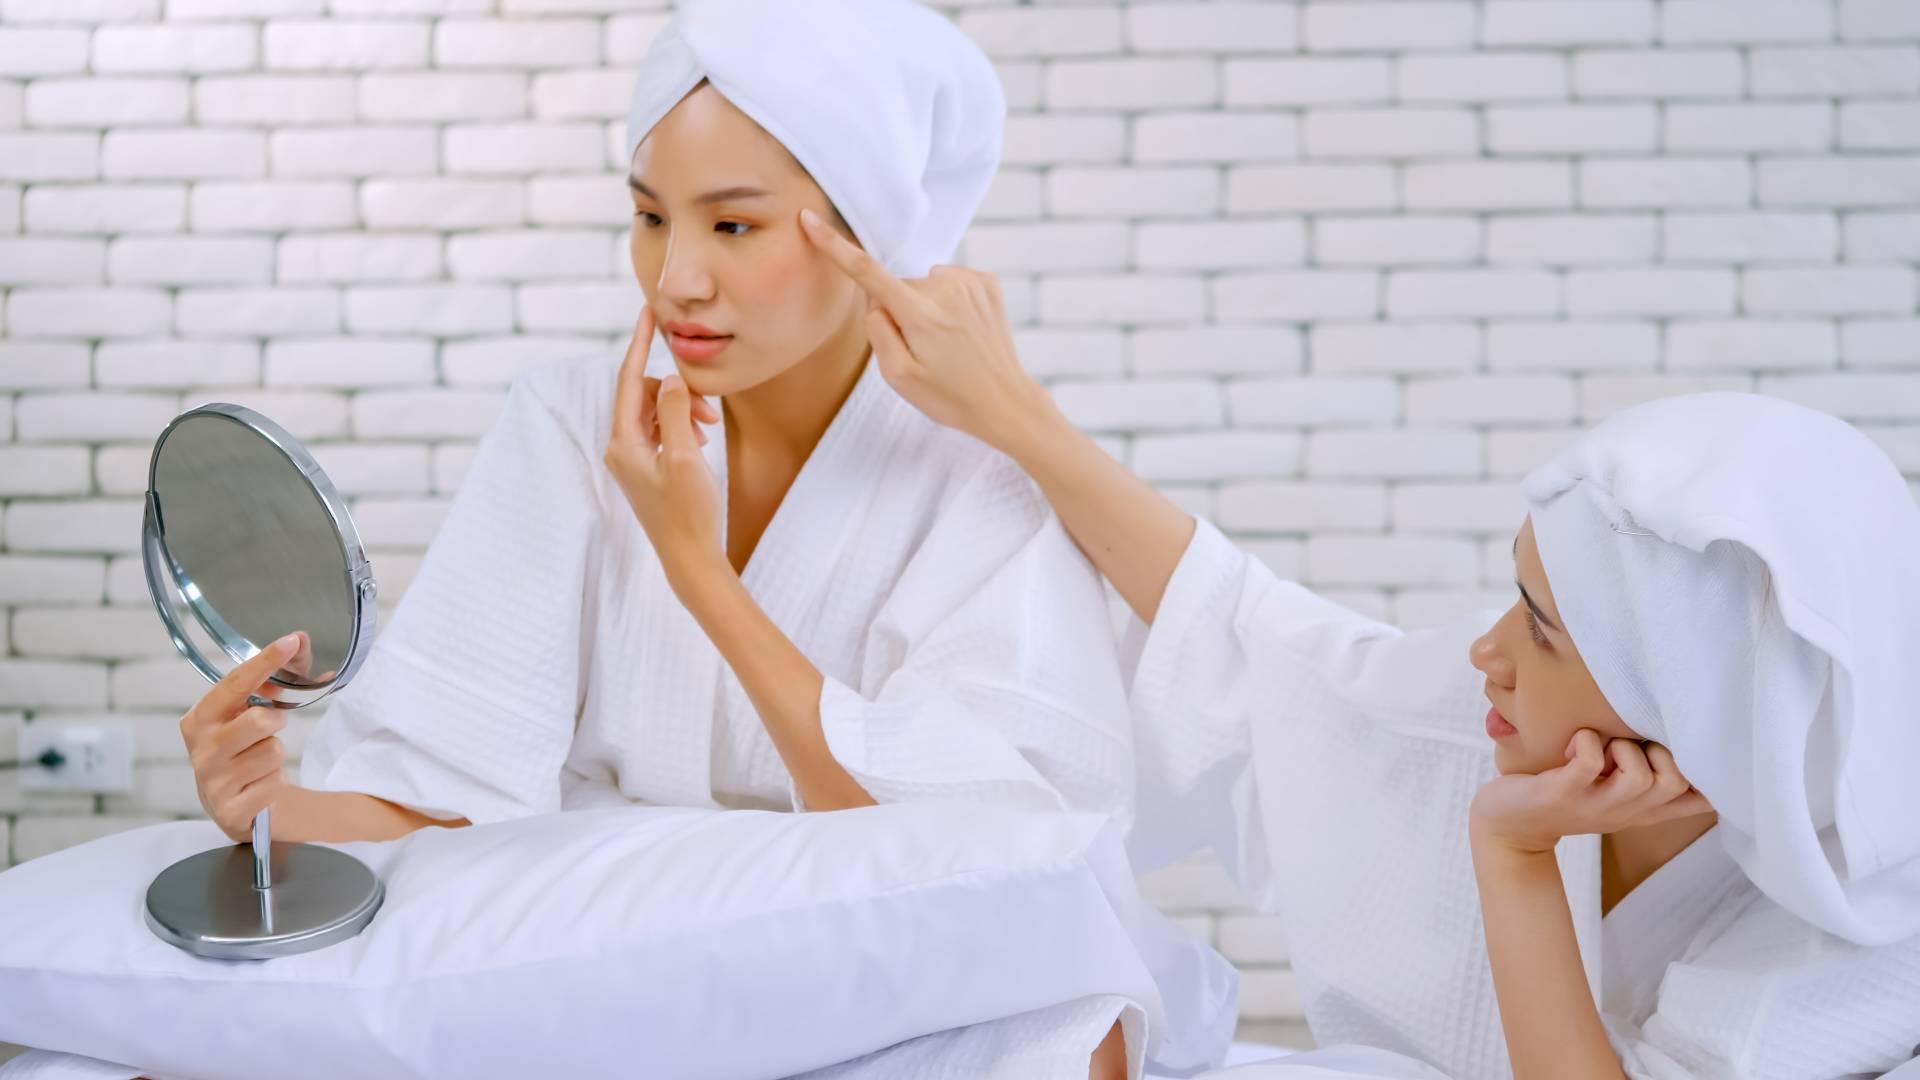 5 Hal yang Perlu Kamu Ketahui Sebelum Lakukan Peeling Wajah